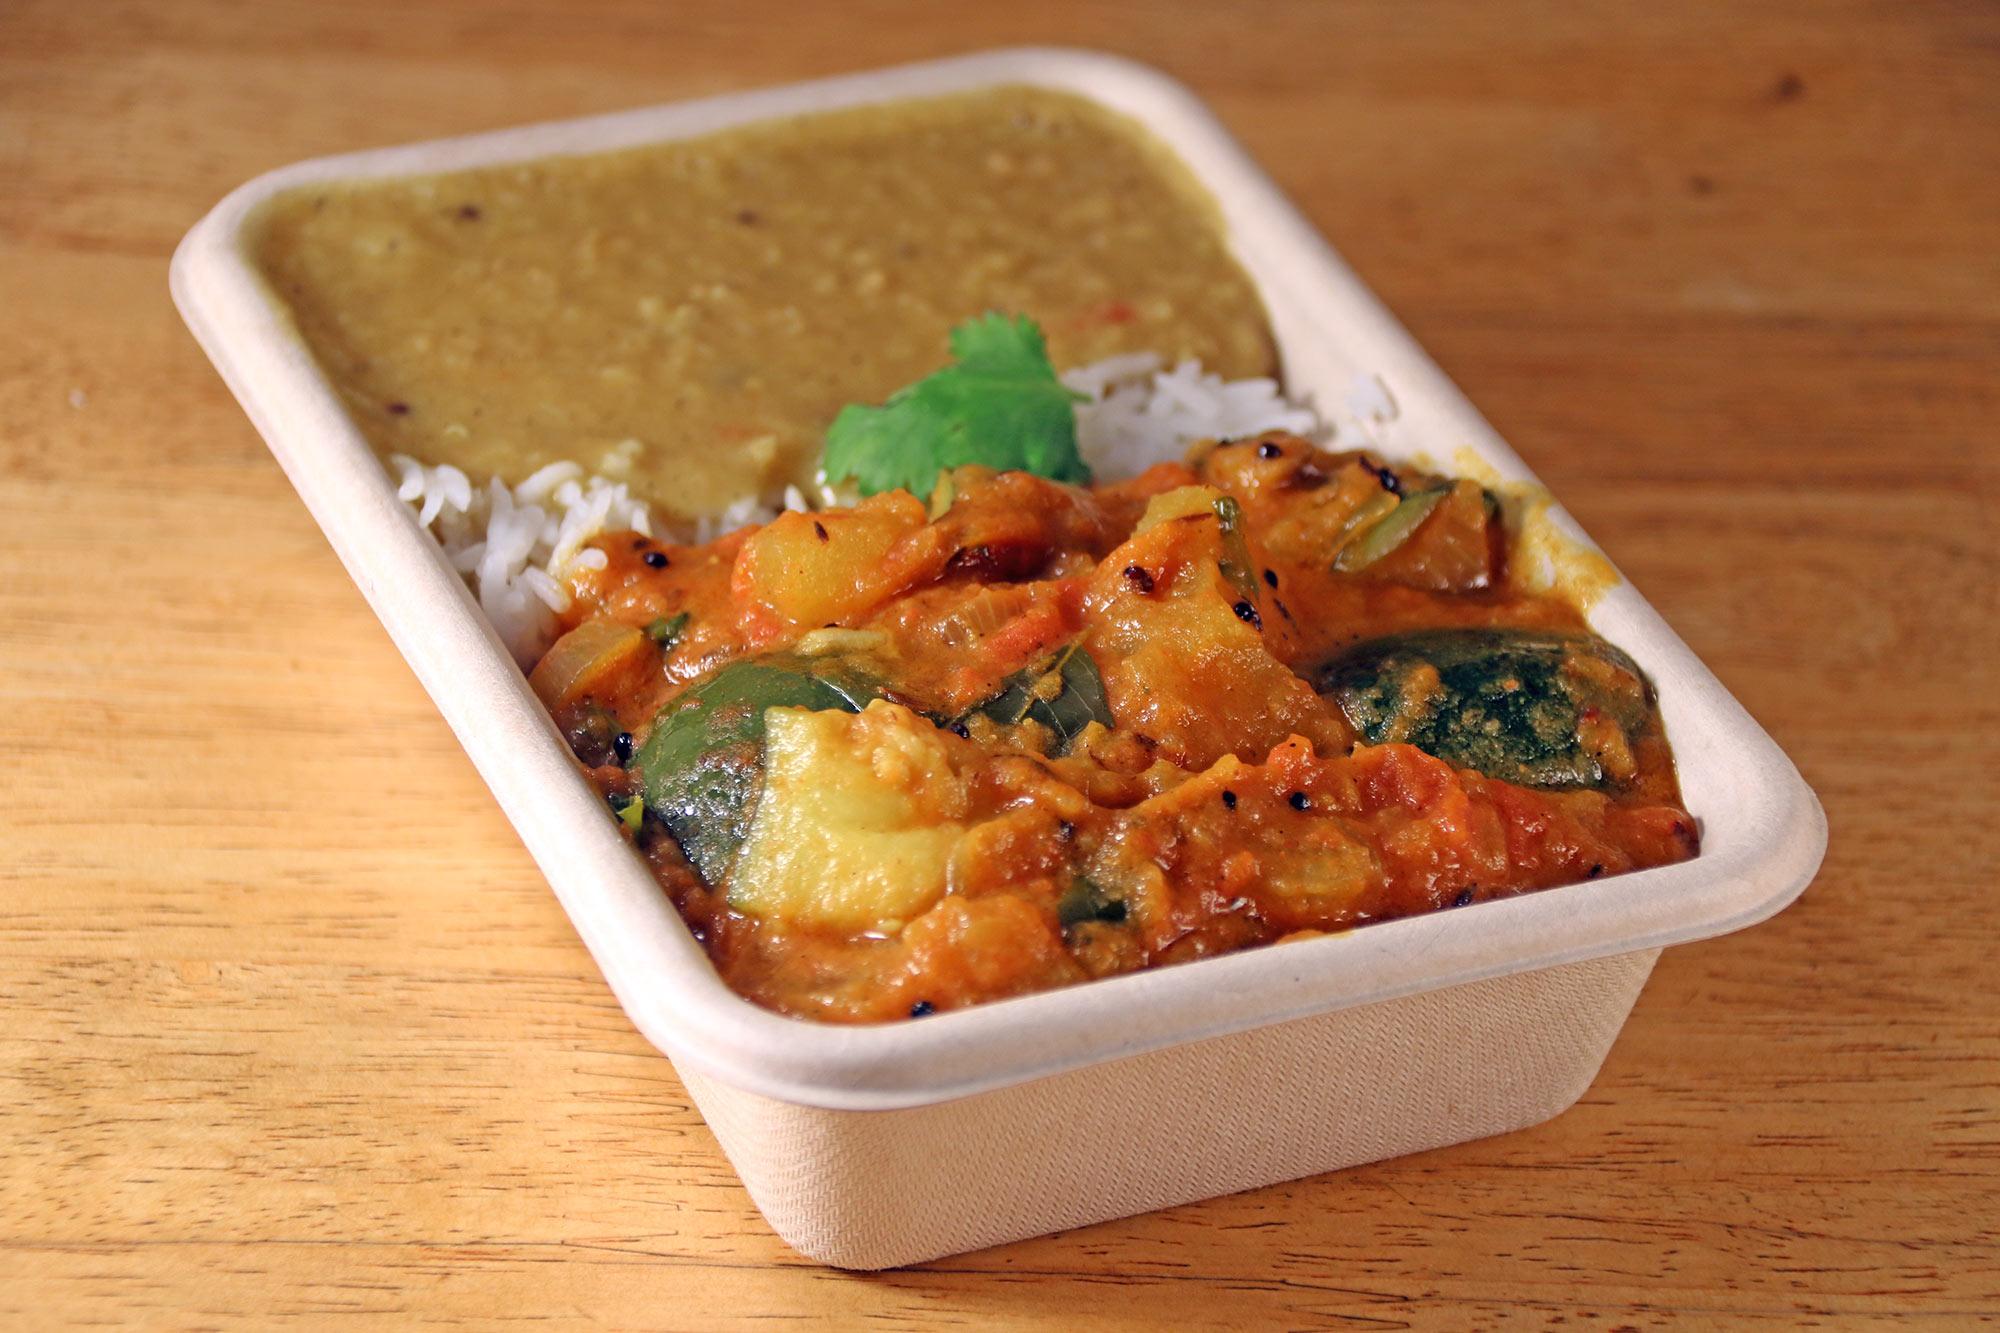 South Indian potato, zucchini & mushroom curry